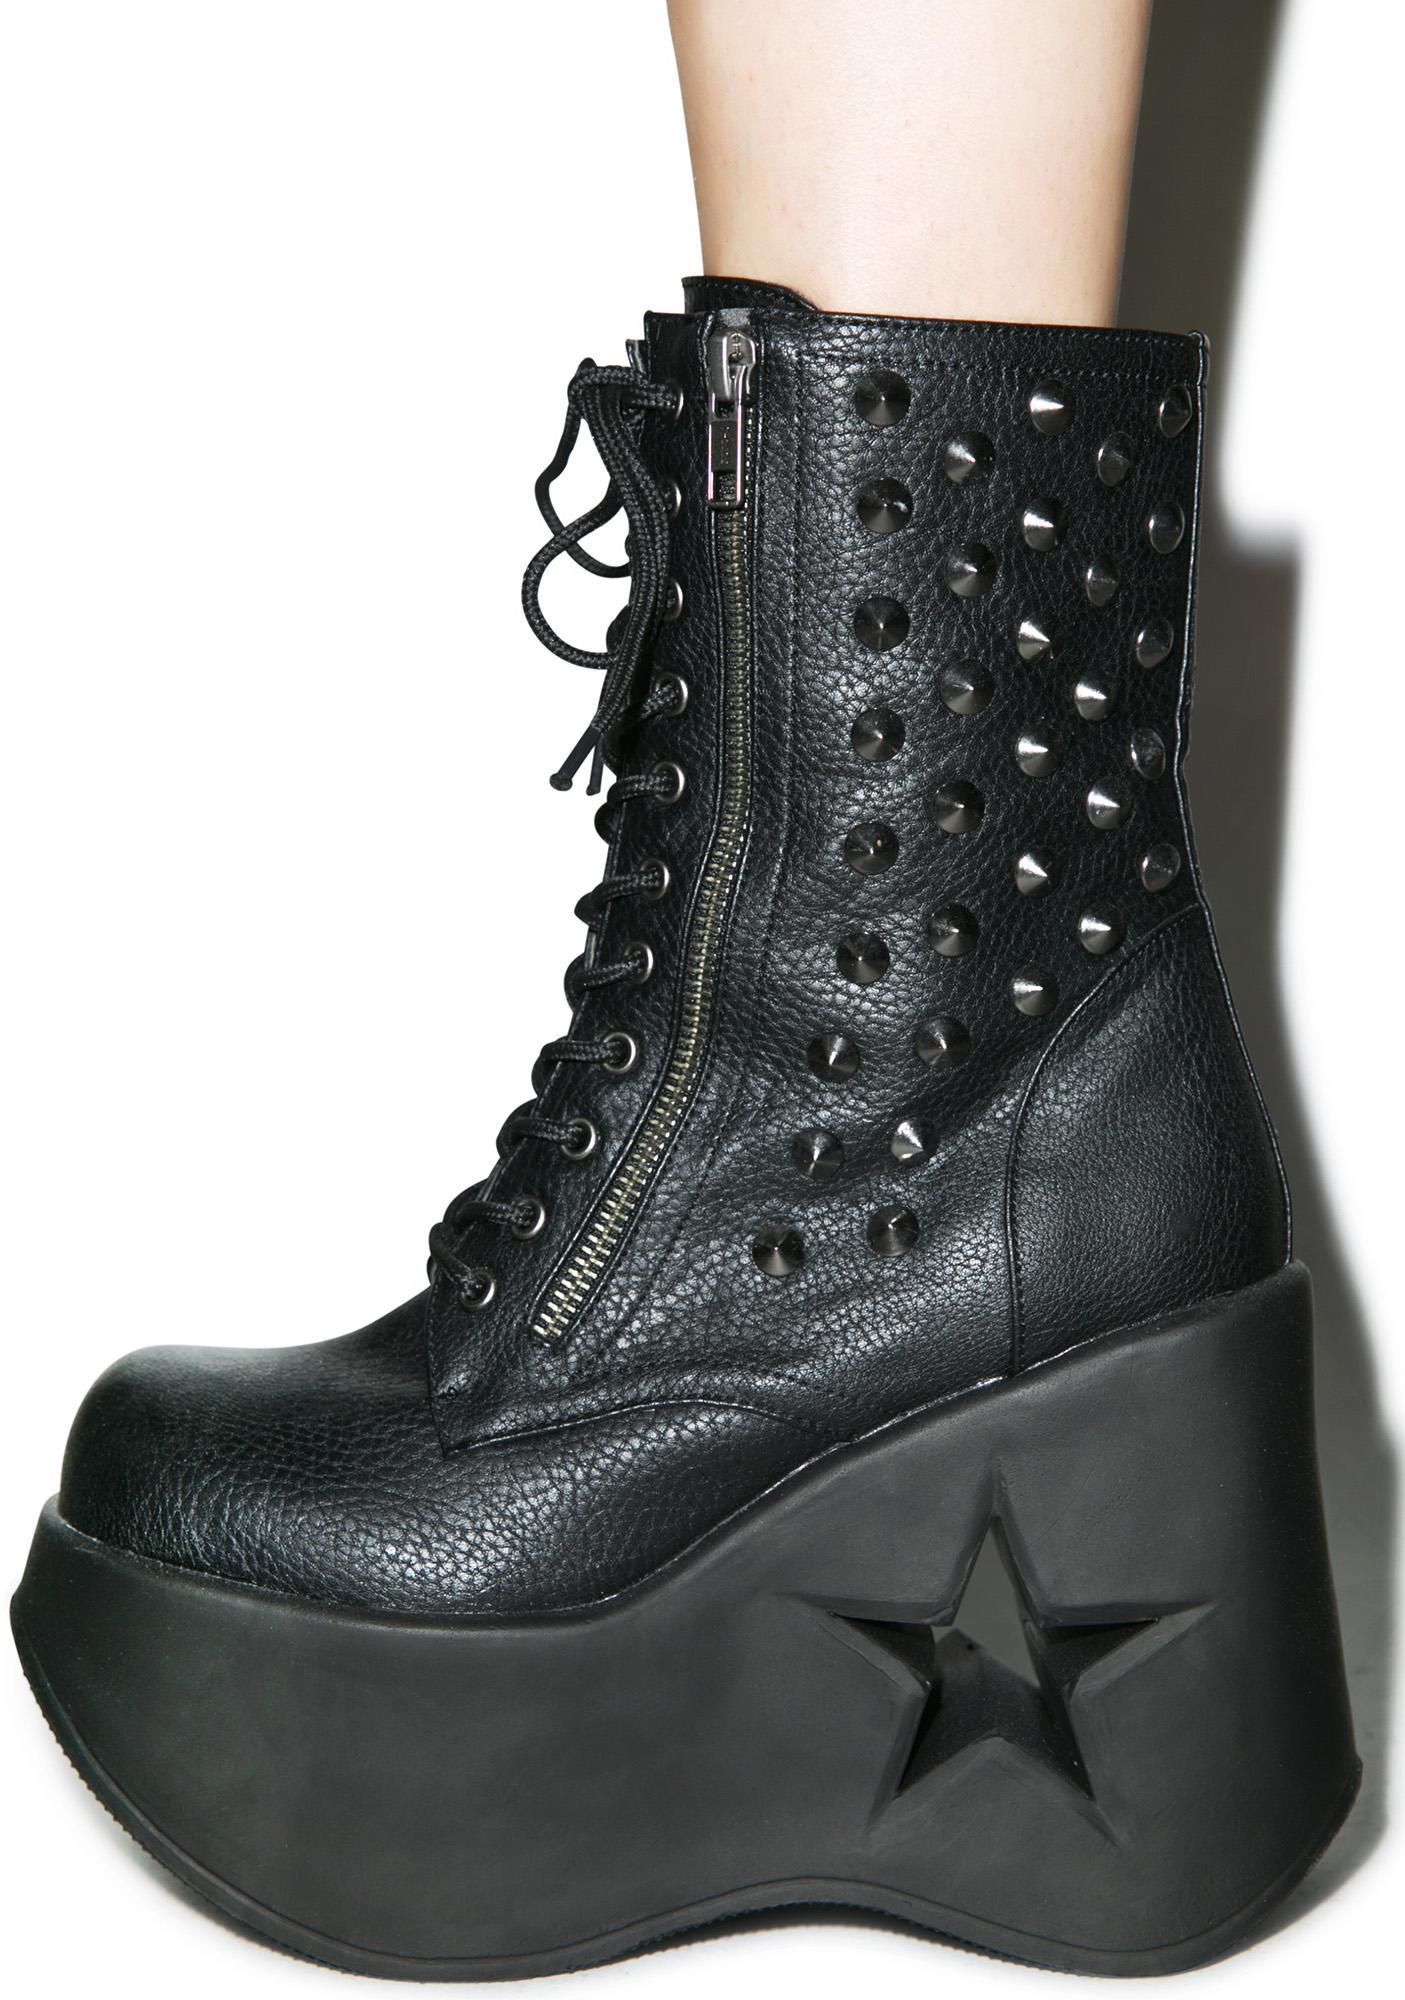 Demonia Dynamite Platform Boots